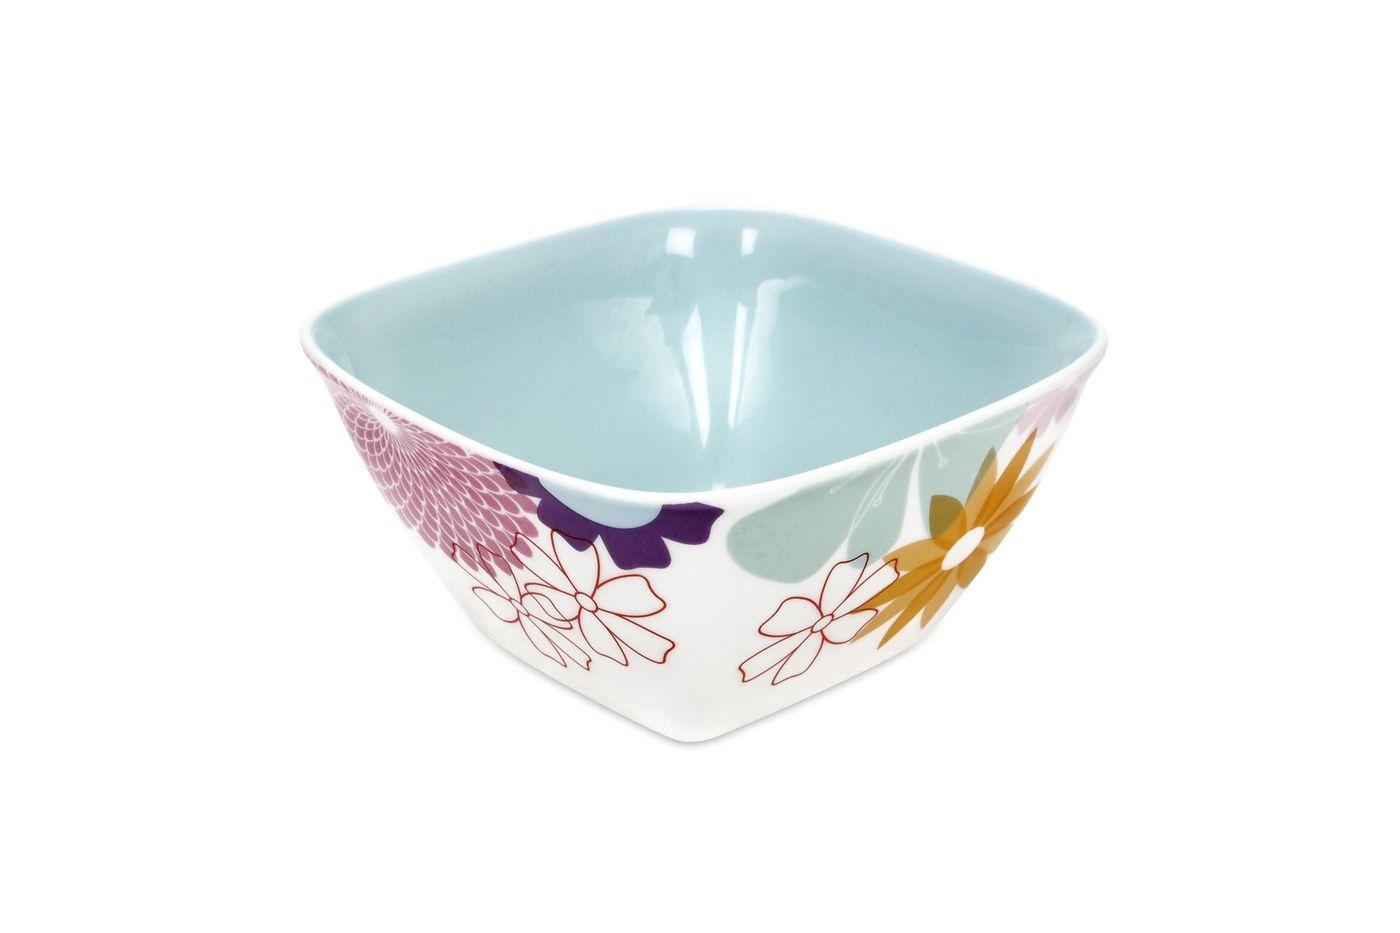 Crazy Daisy Portmeirion Floral 15cm Footed Bowl Single